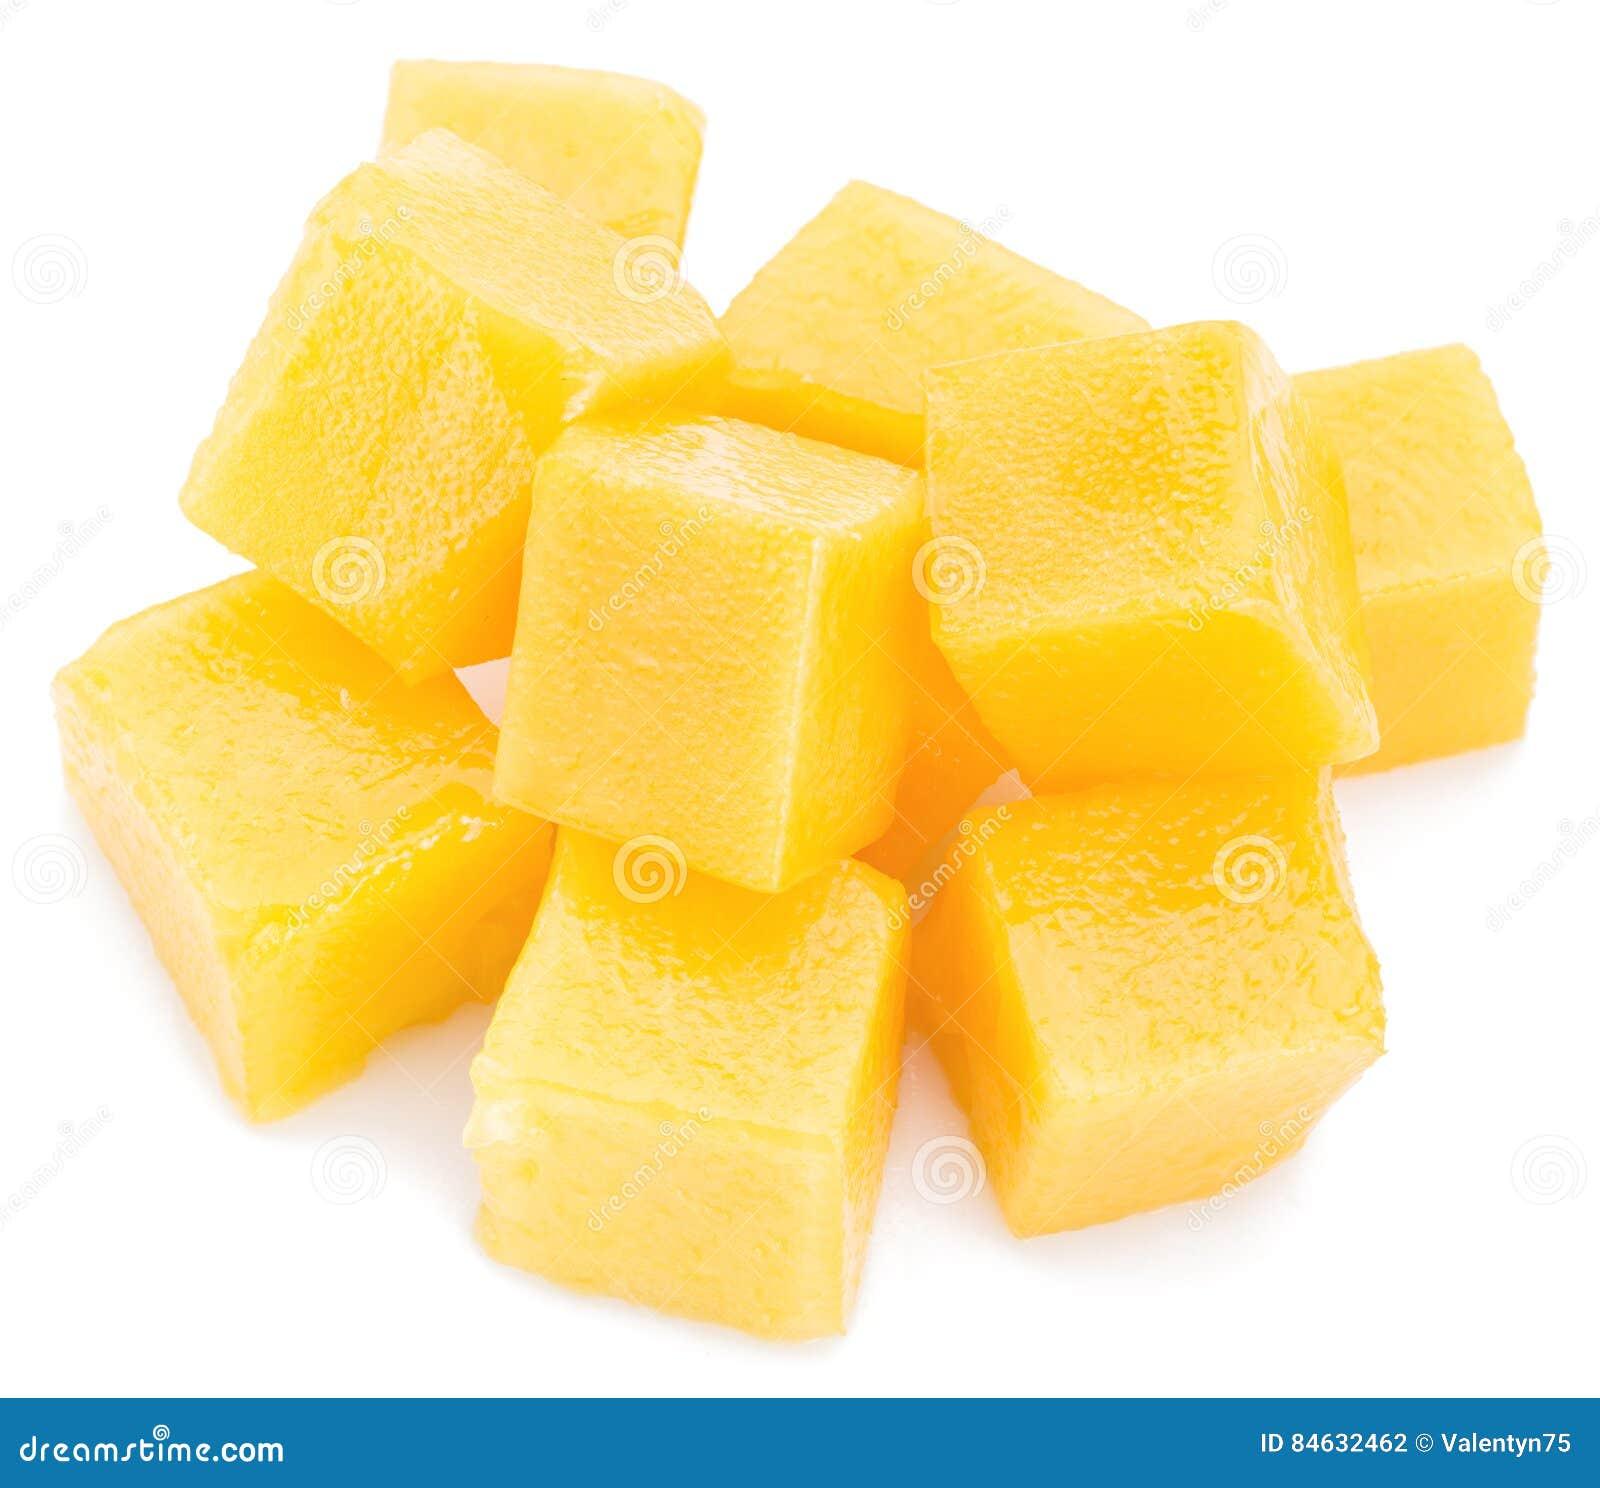 Mangokuber